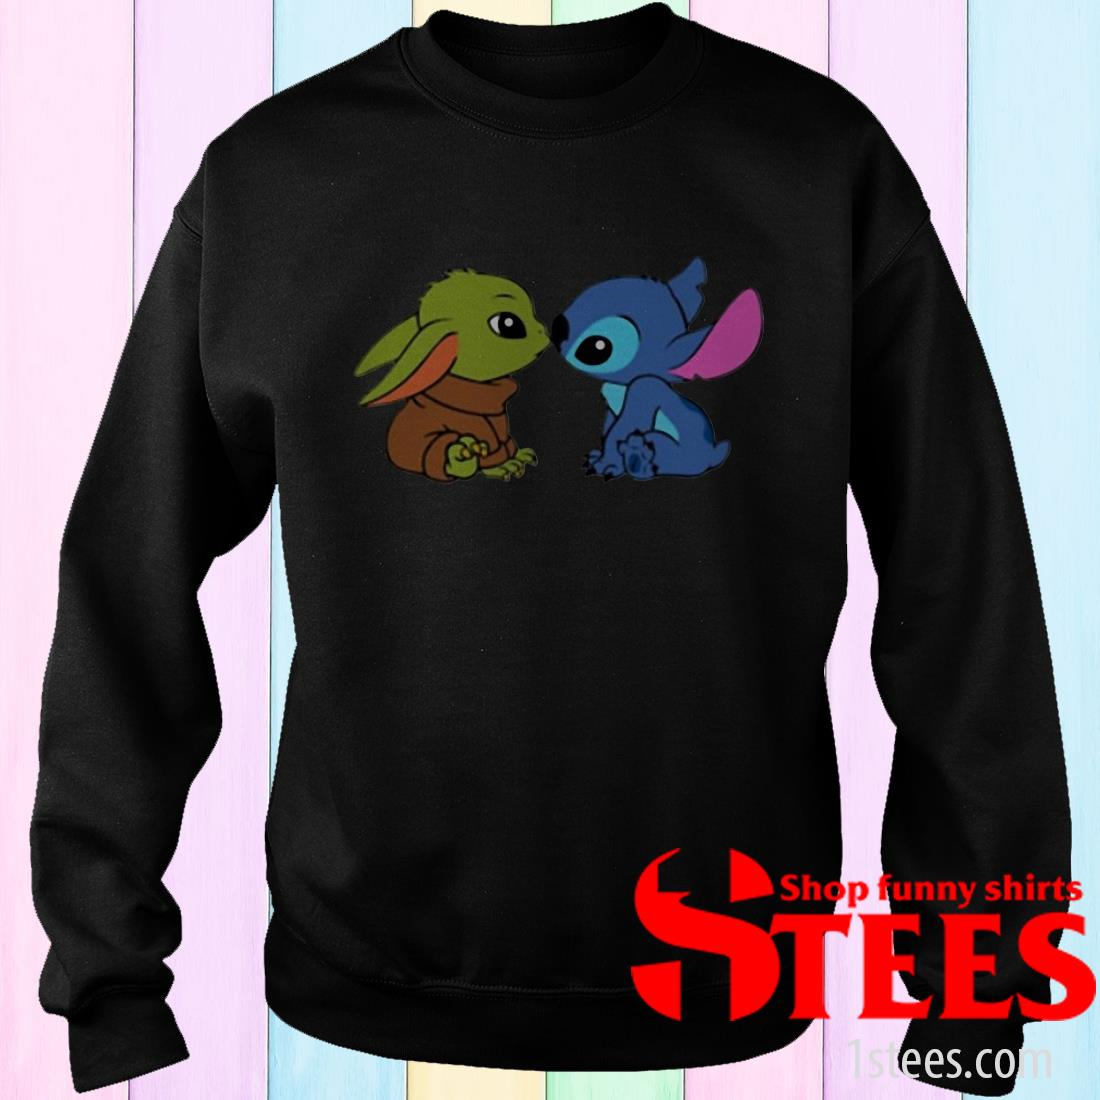 Baby Yoda And Baby Stitch SweatshirtYoda And Baby Stitch Shirt